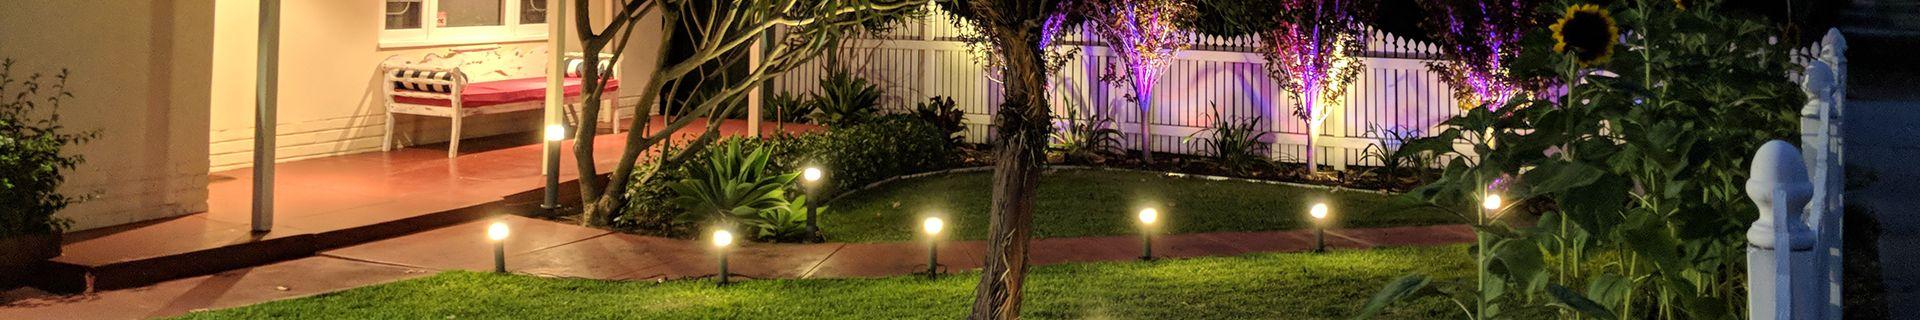 A front garden with a verandah and lighting.